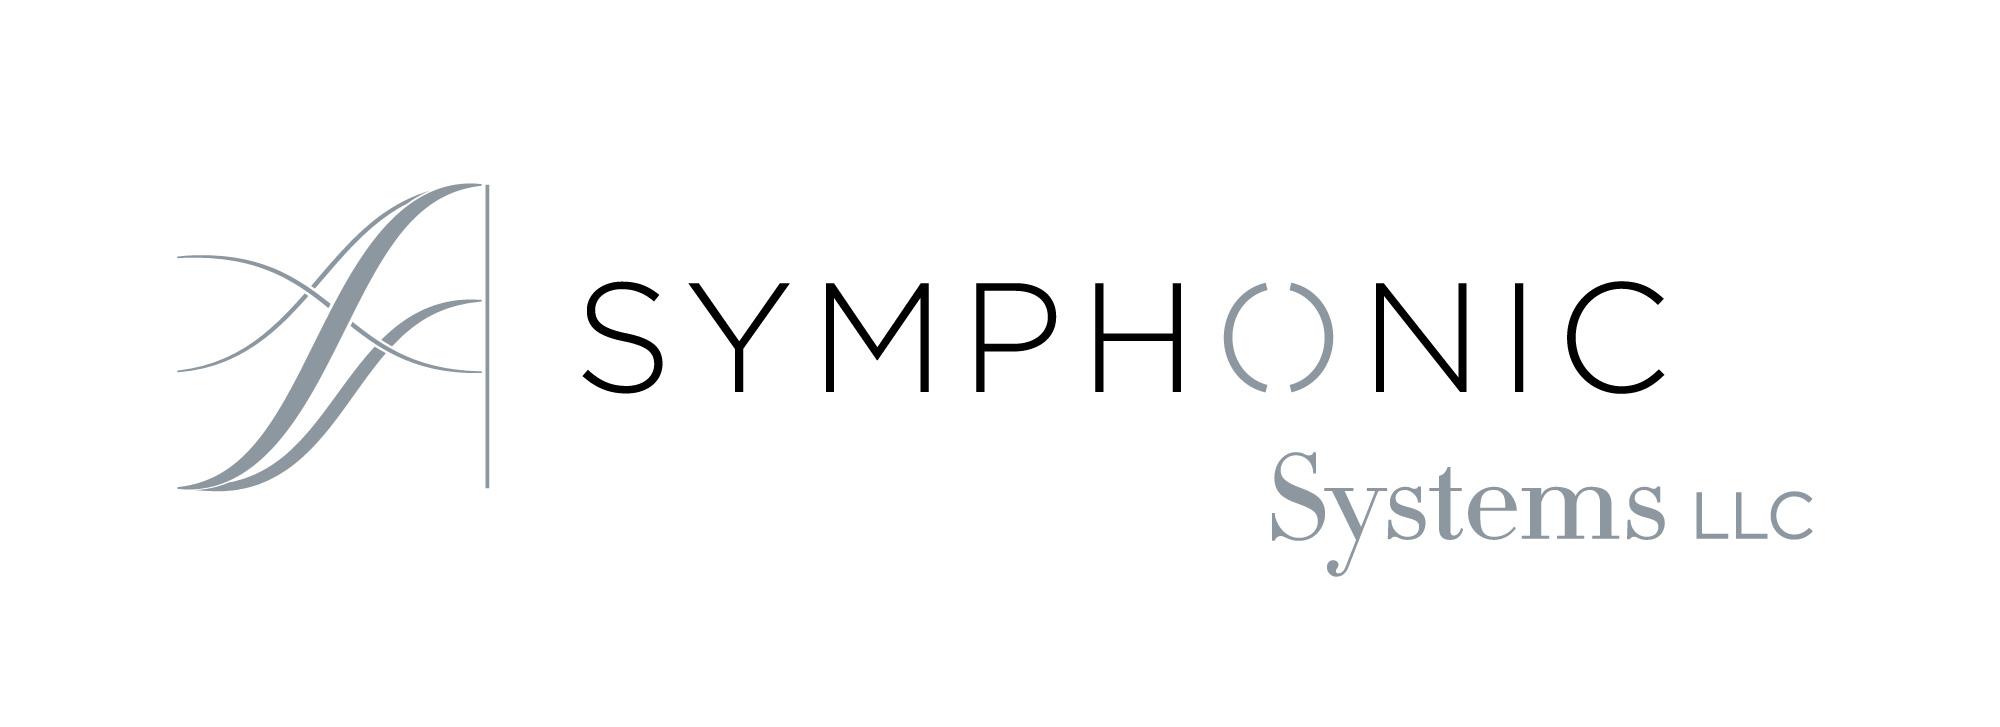 Symphonic Systems Logo Woven